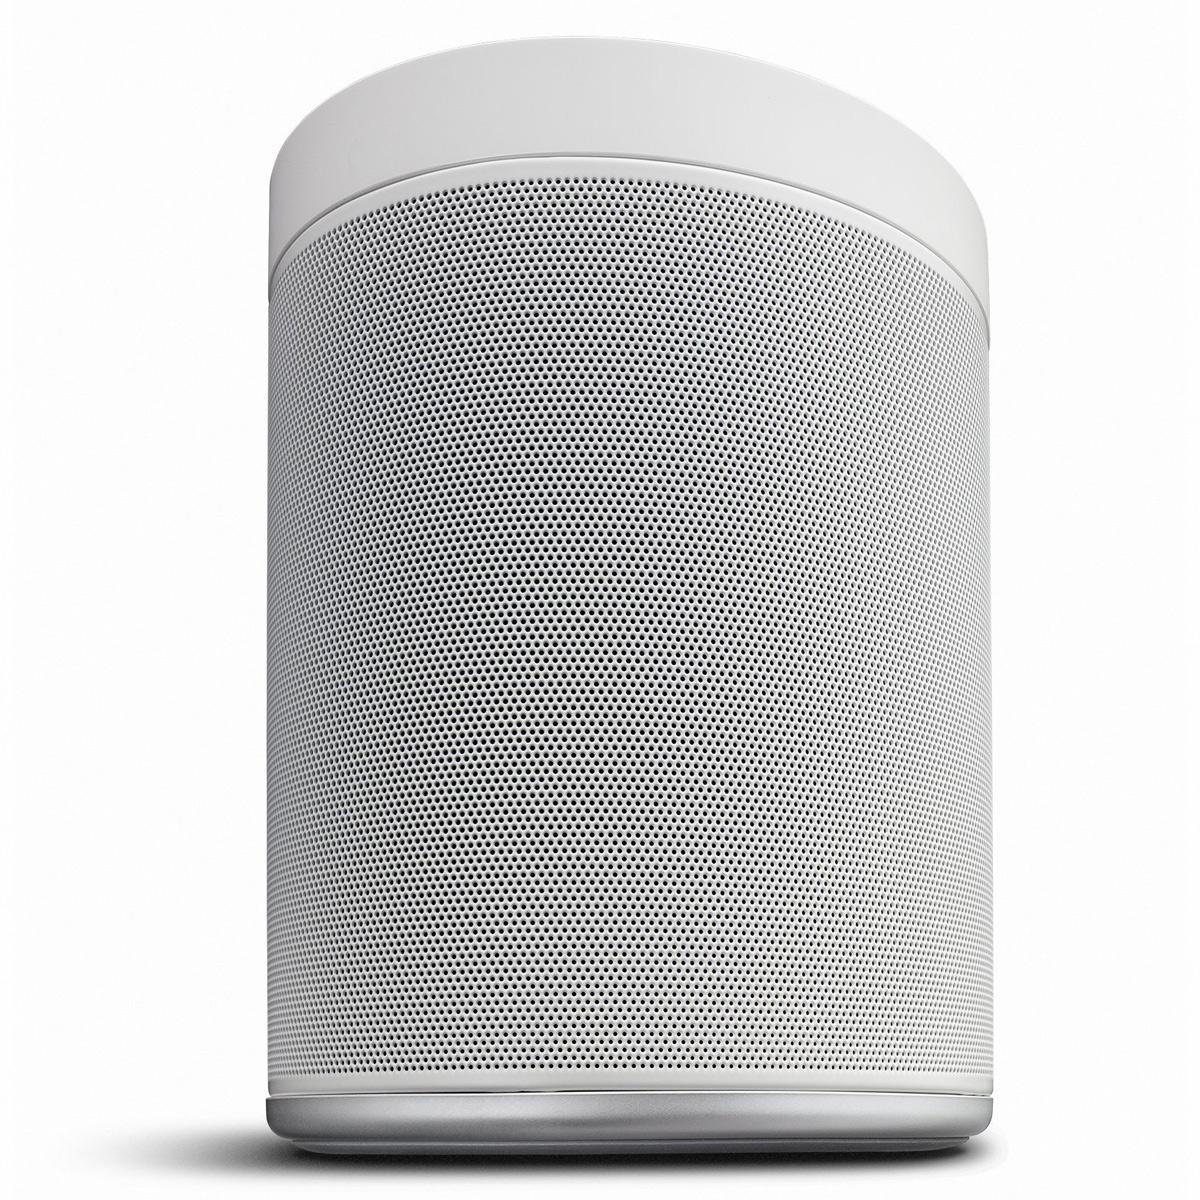 Yamaha-WX-021-MusicCast-20-Wireless-Speaker thumbnail 19